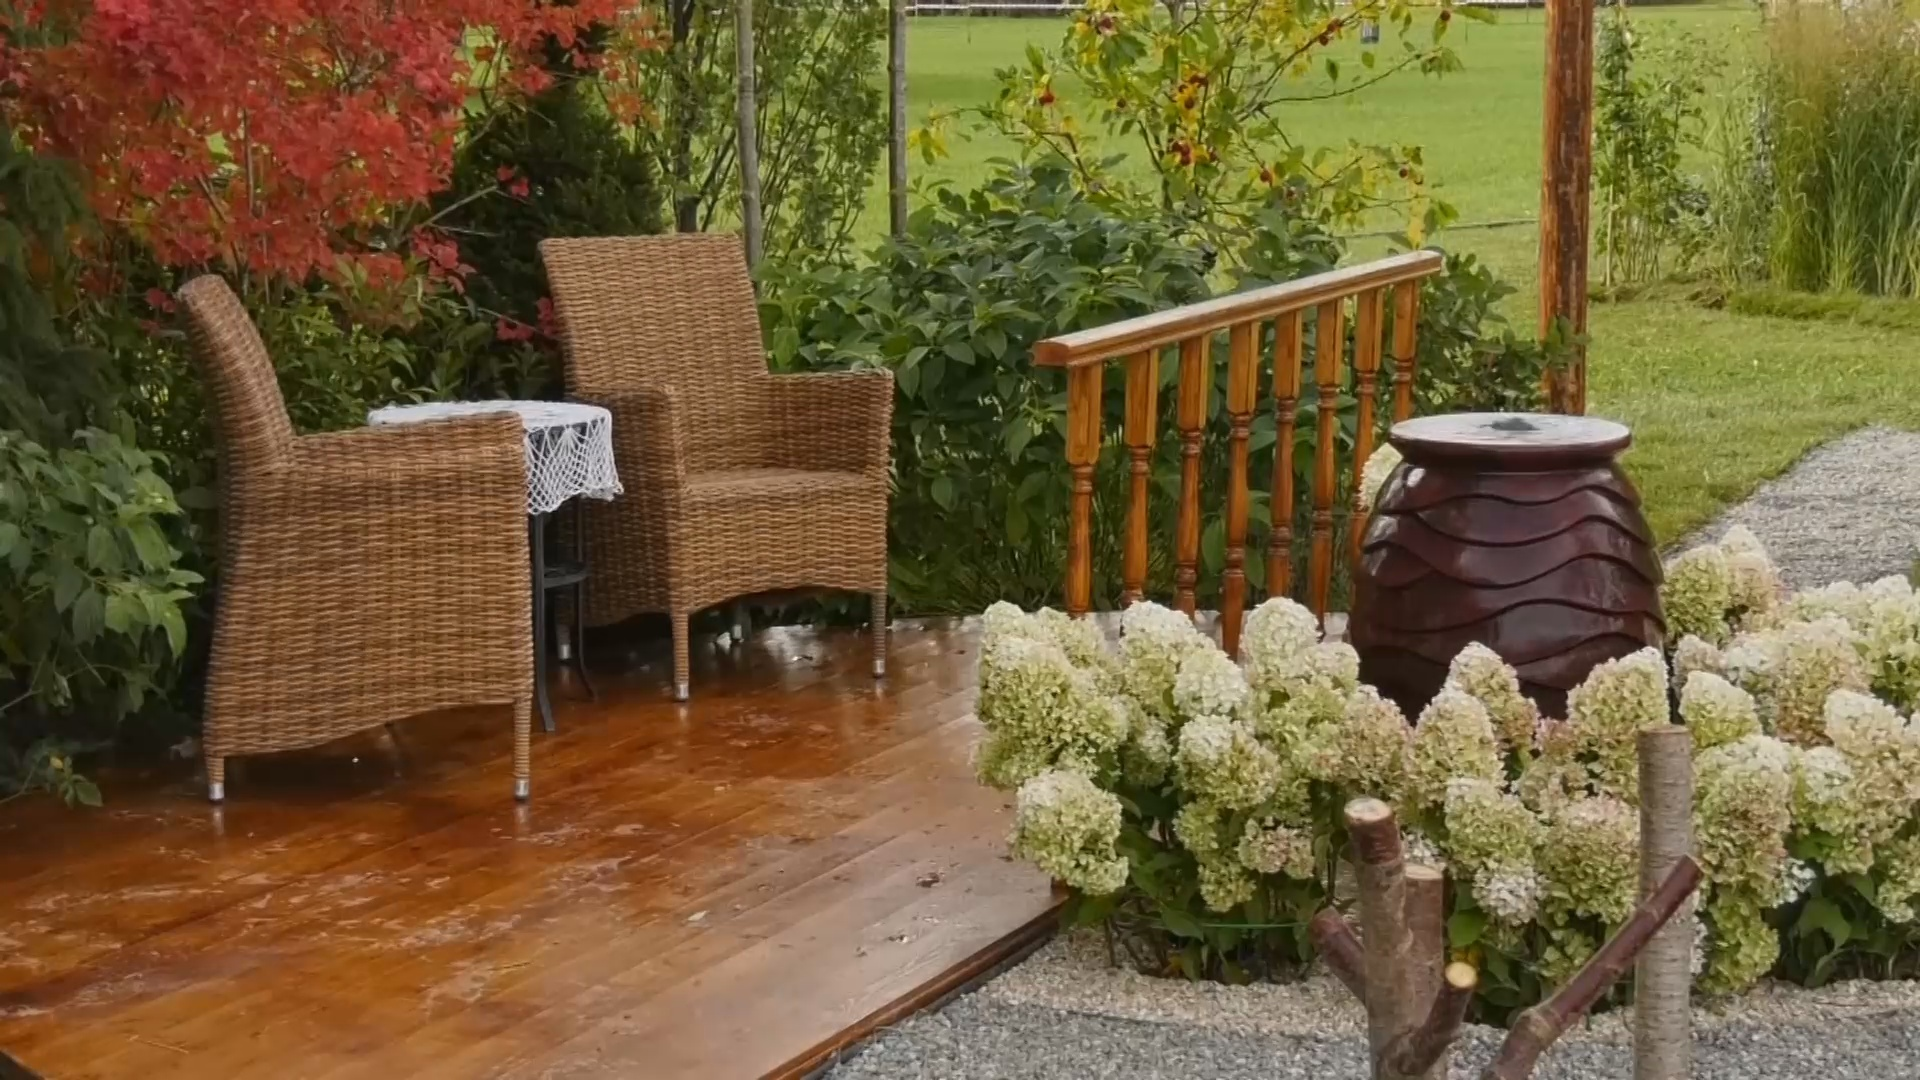 Каким был русский сад: 12 ландшафтных композиций в «Царицыно»